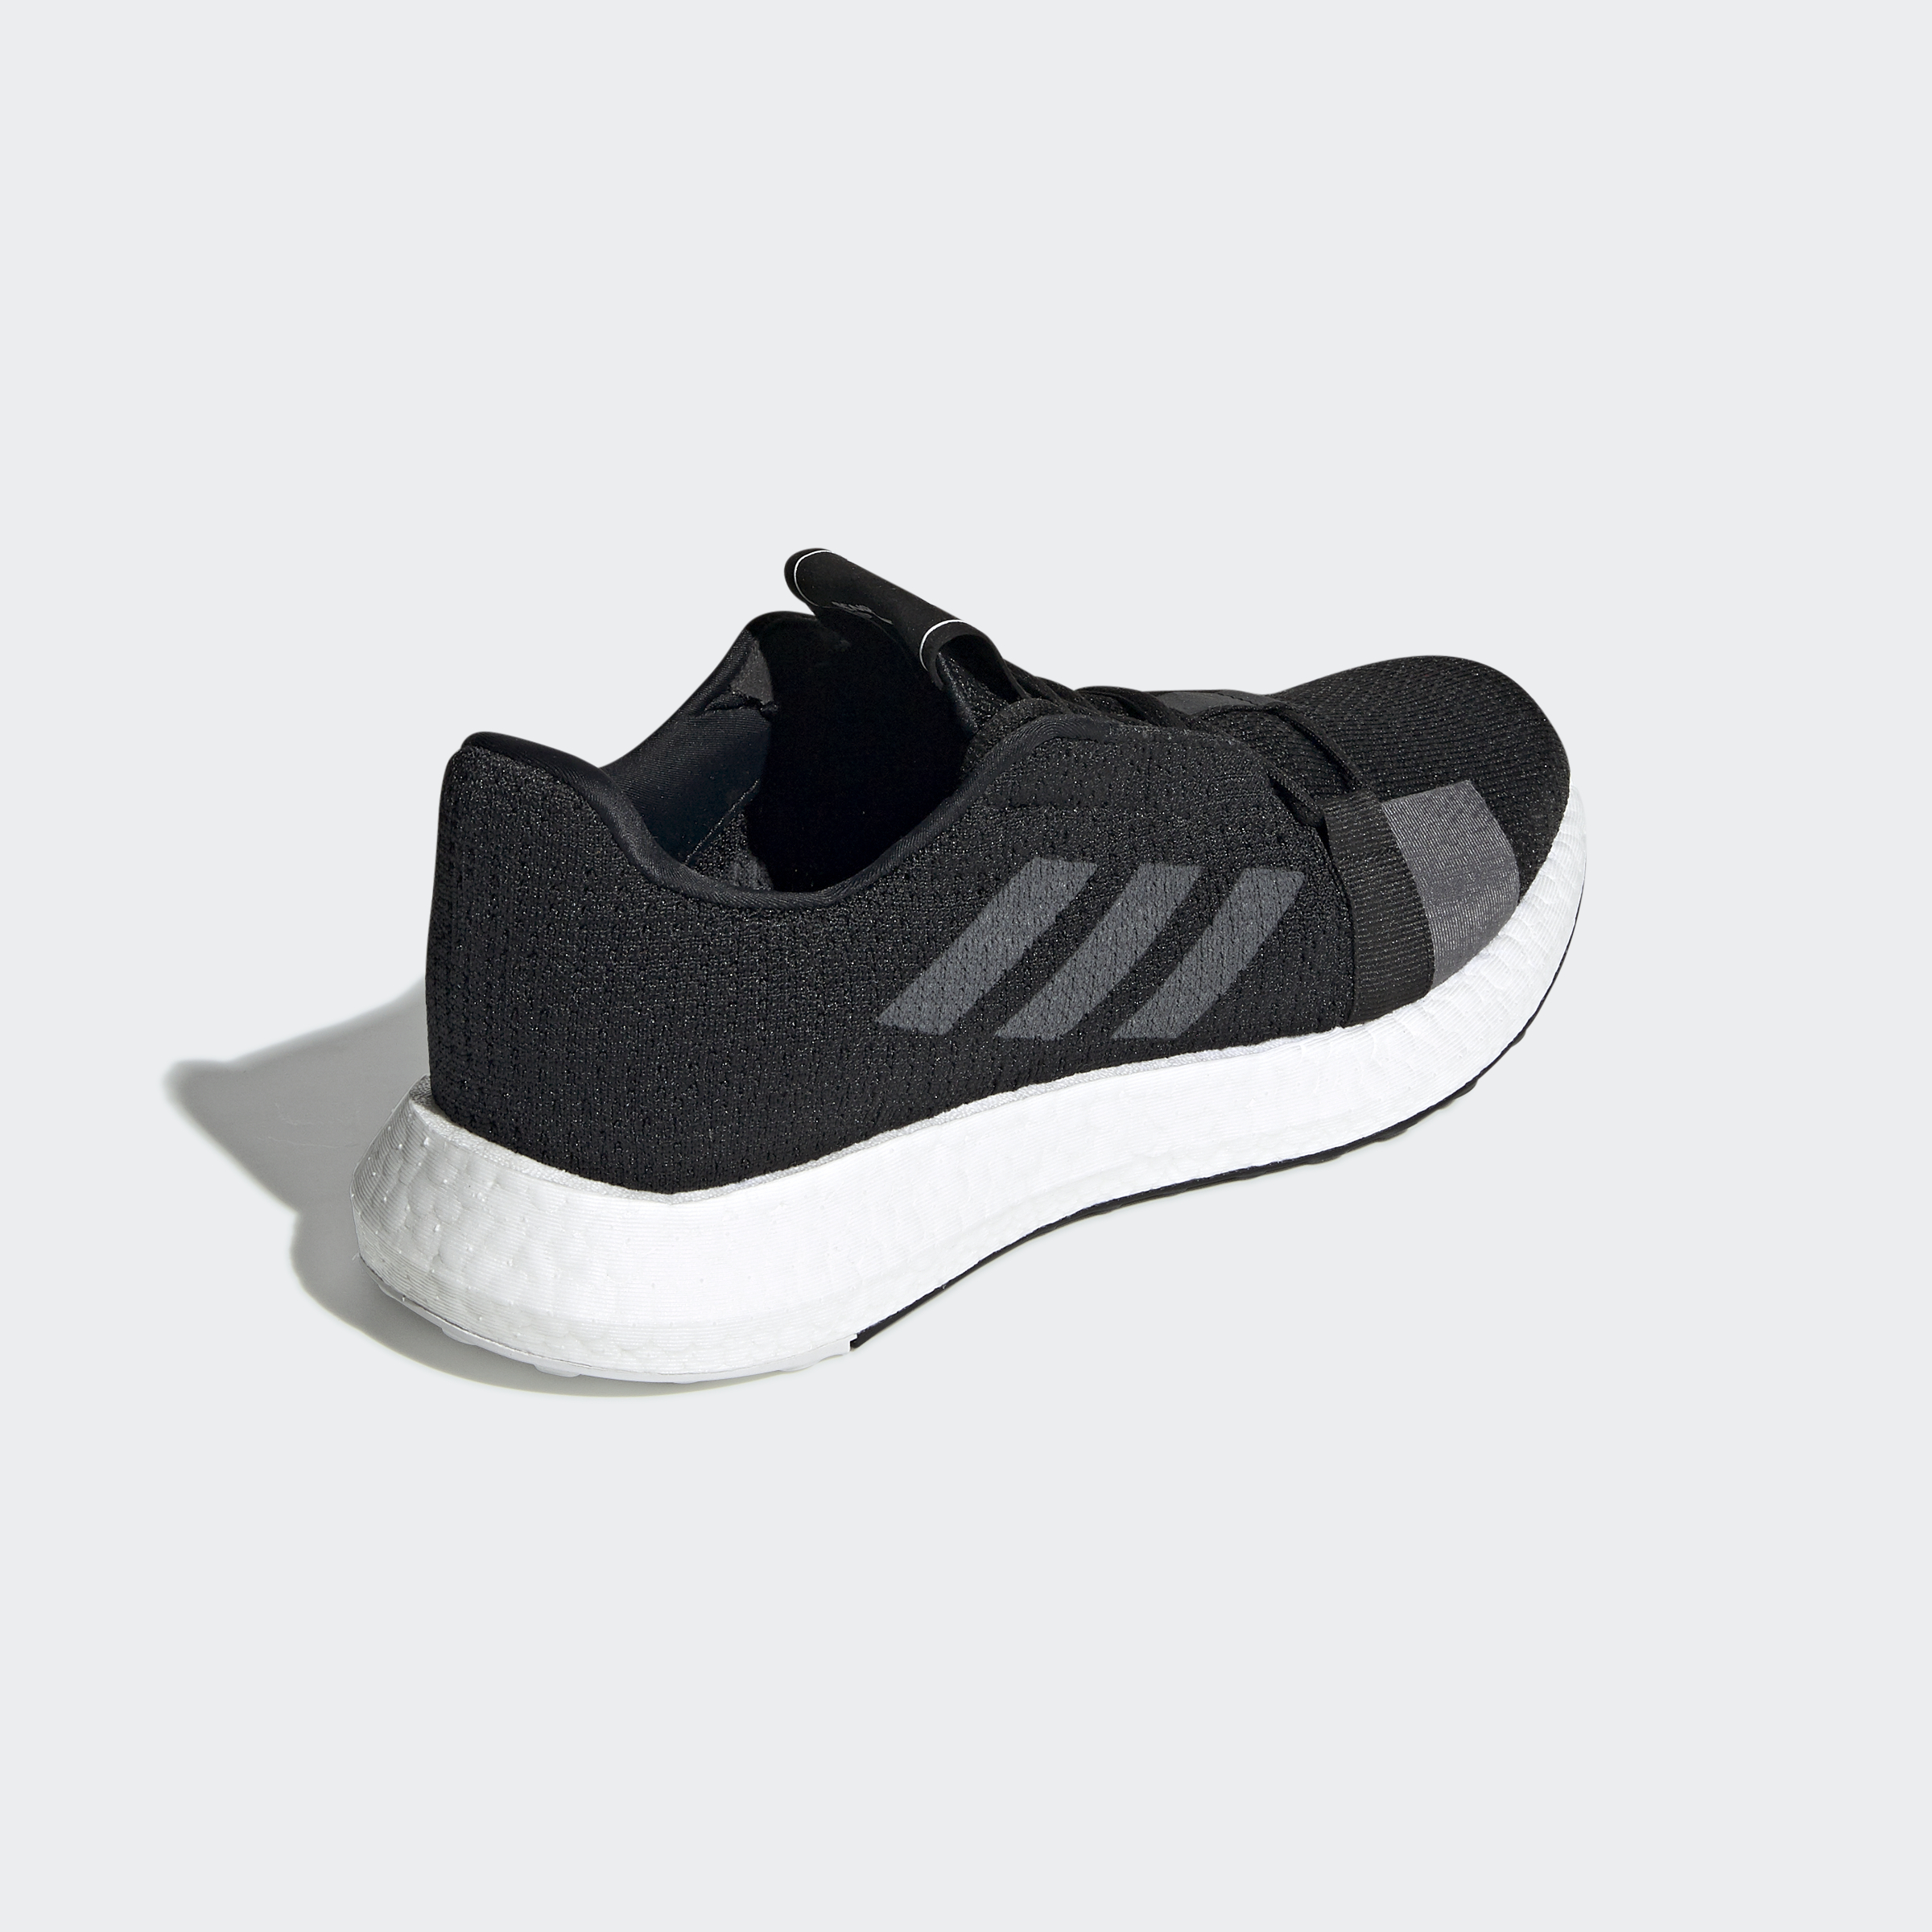 miniature 25 - adidas Senseboost Go Shoes Men's Athletic & Sneakers